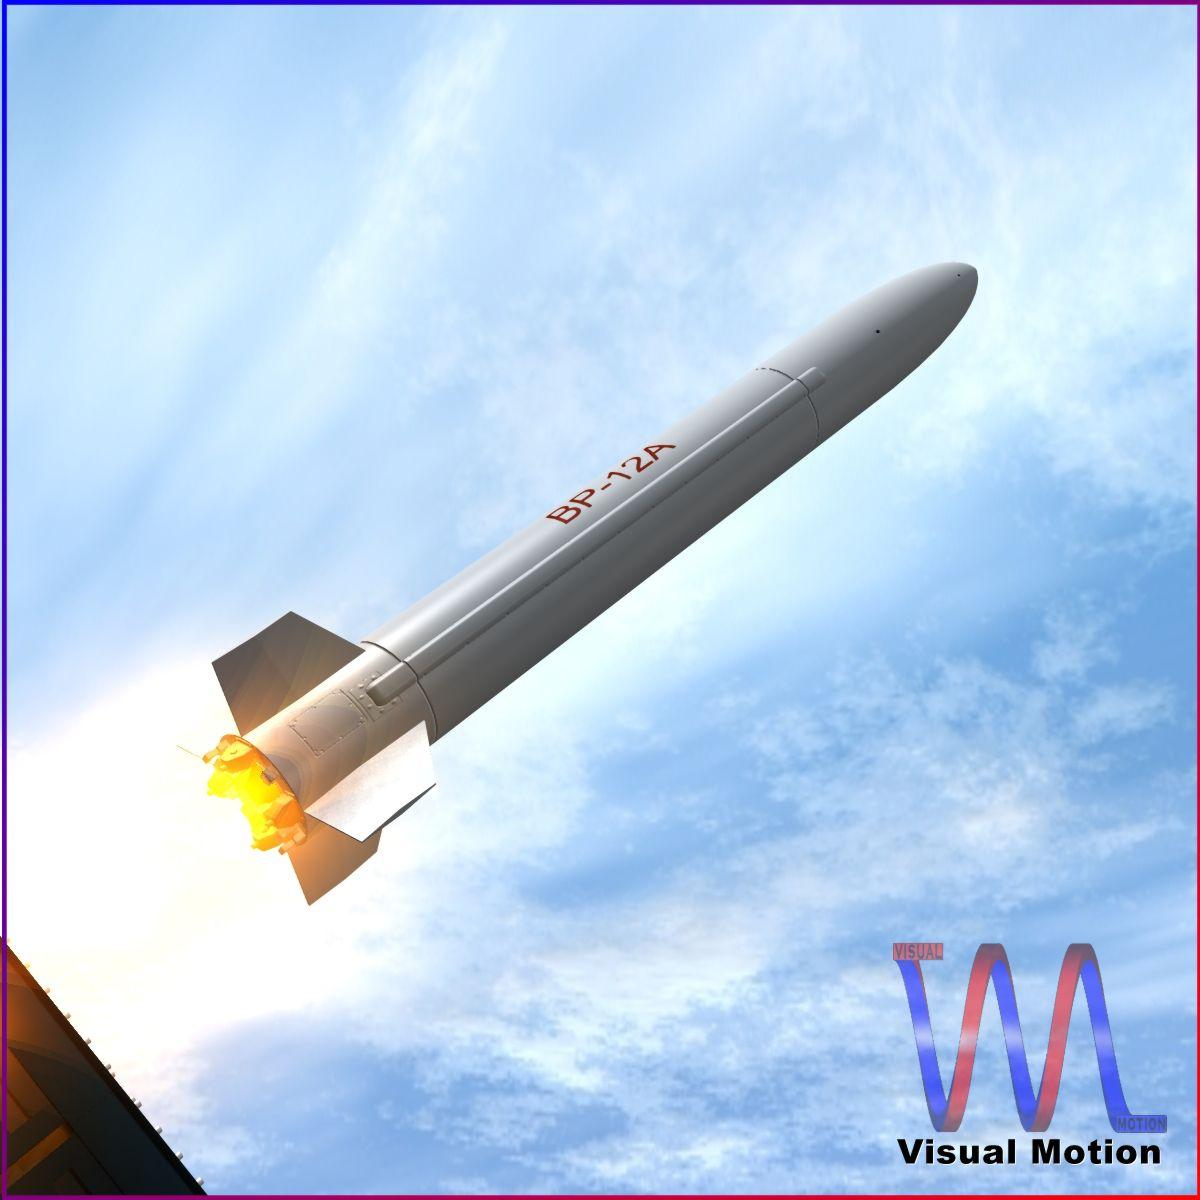 BP-12A Missile 3d model 3ds dxf fbx blend cob dae X obj 217507